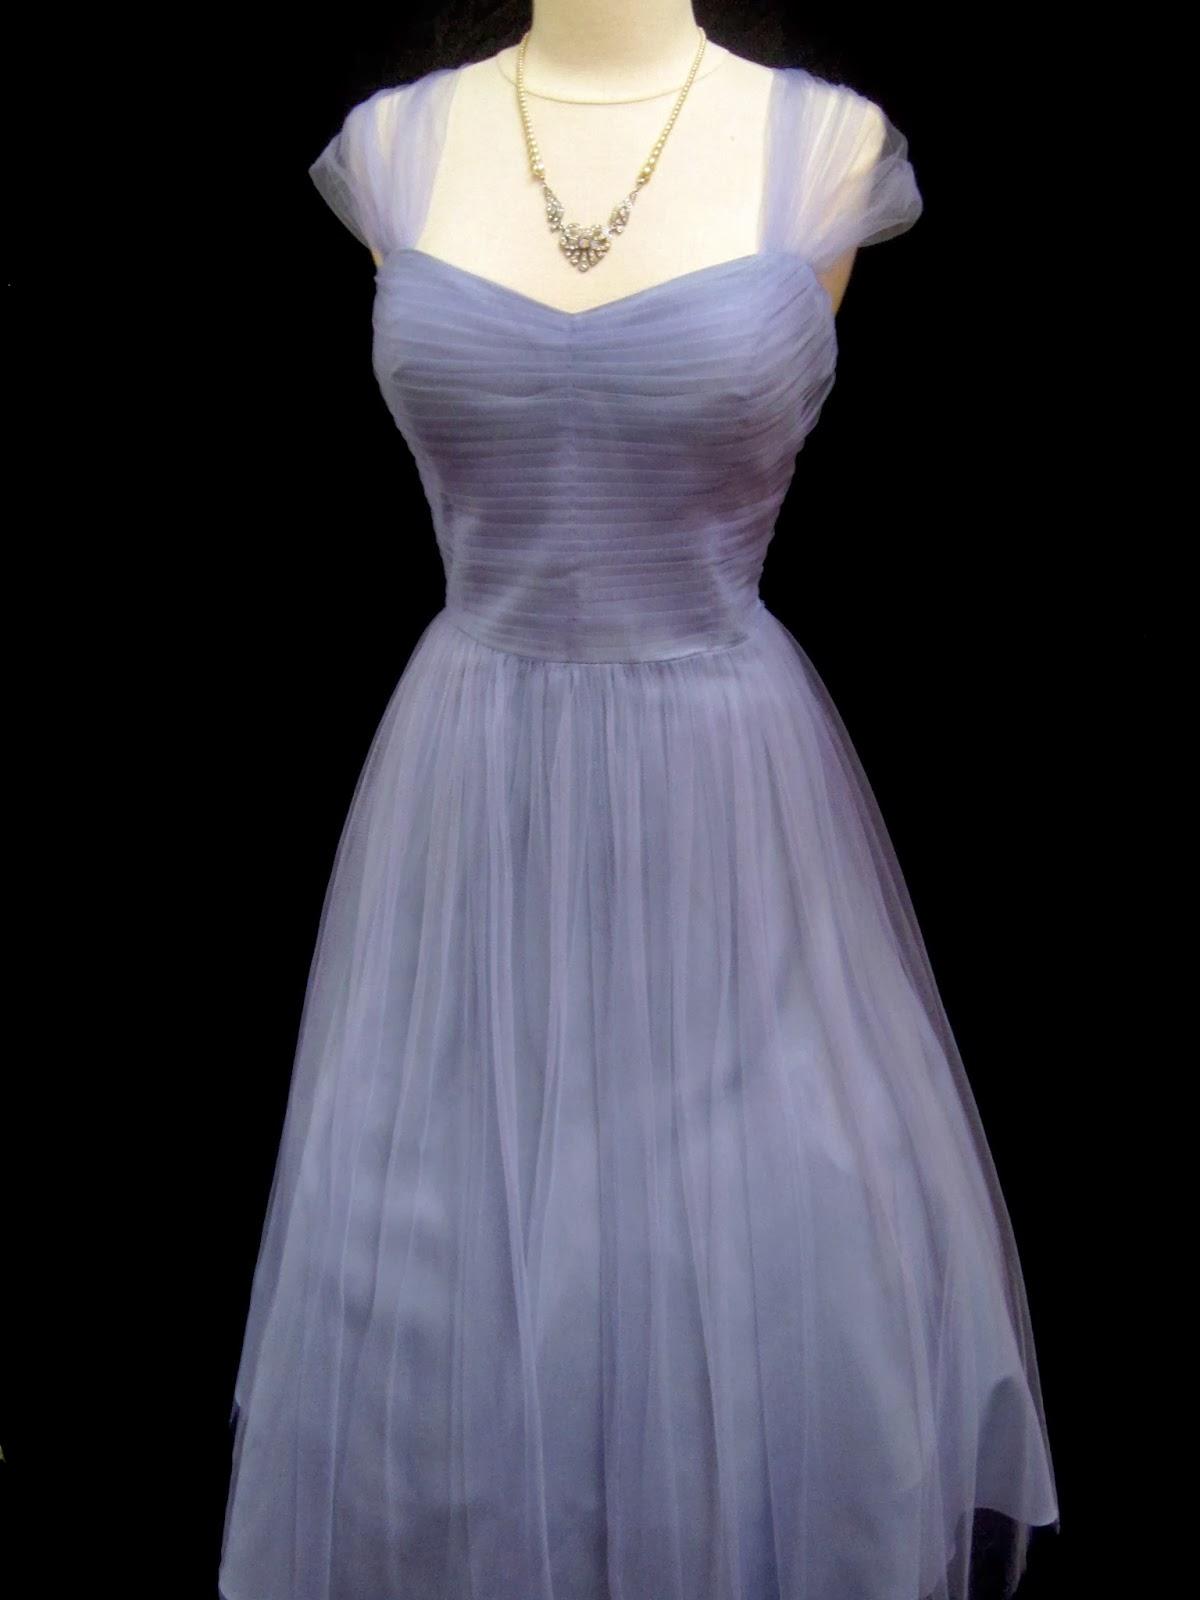 1950s bridesmaid dresses ireland 1950s bridesmaid dresses ireland 30 ombrellifo Gallery